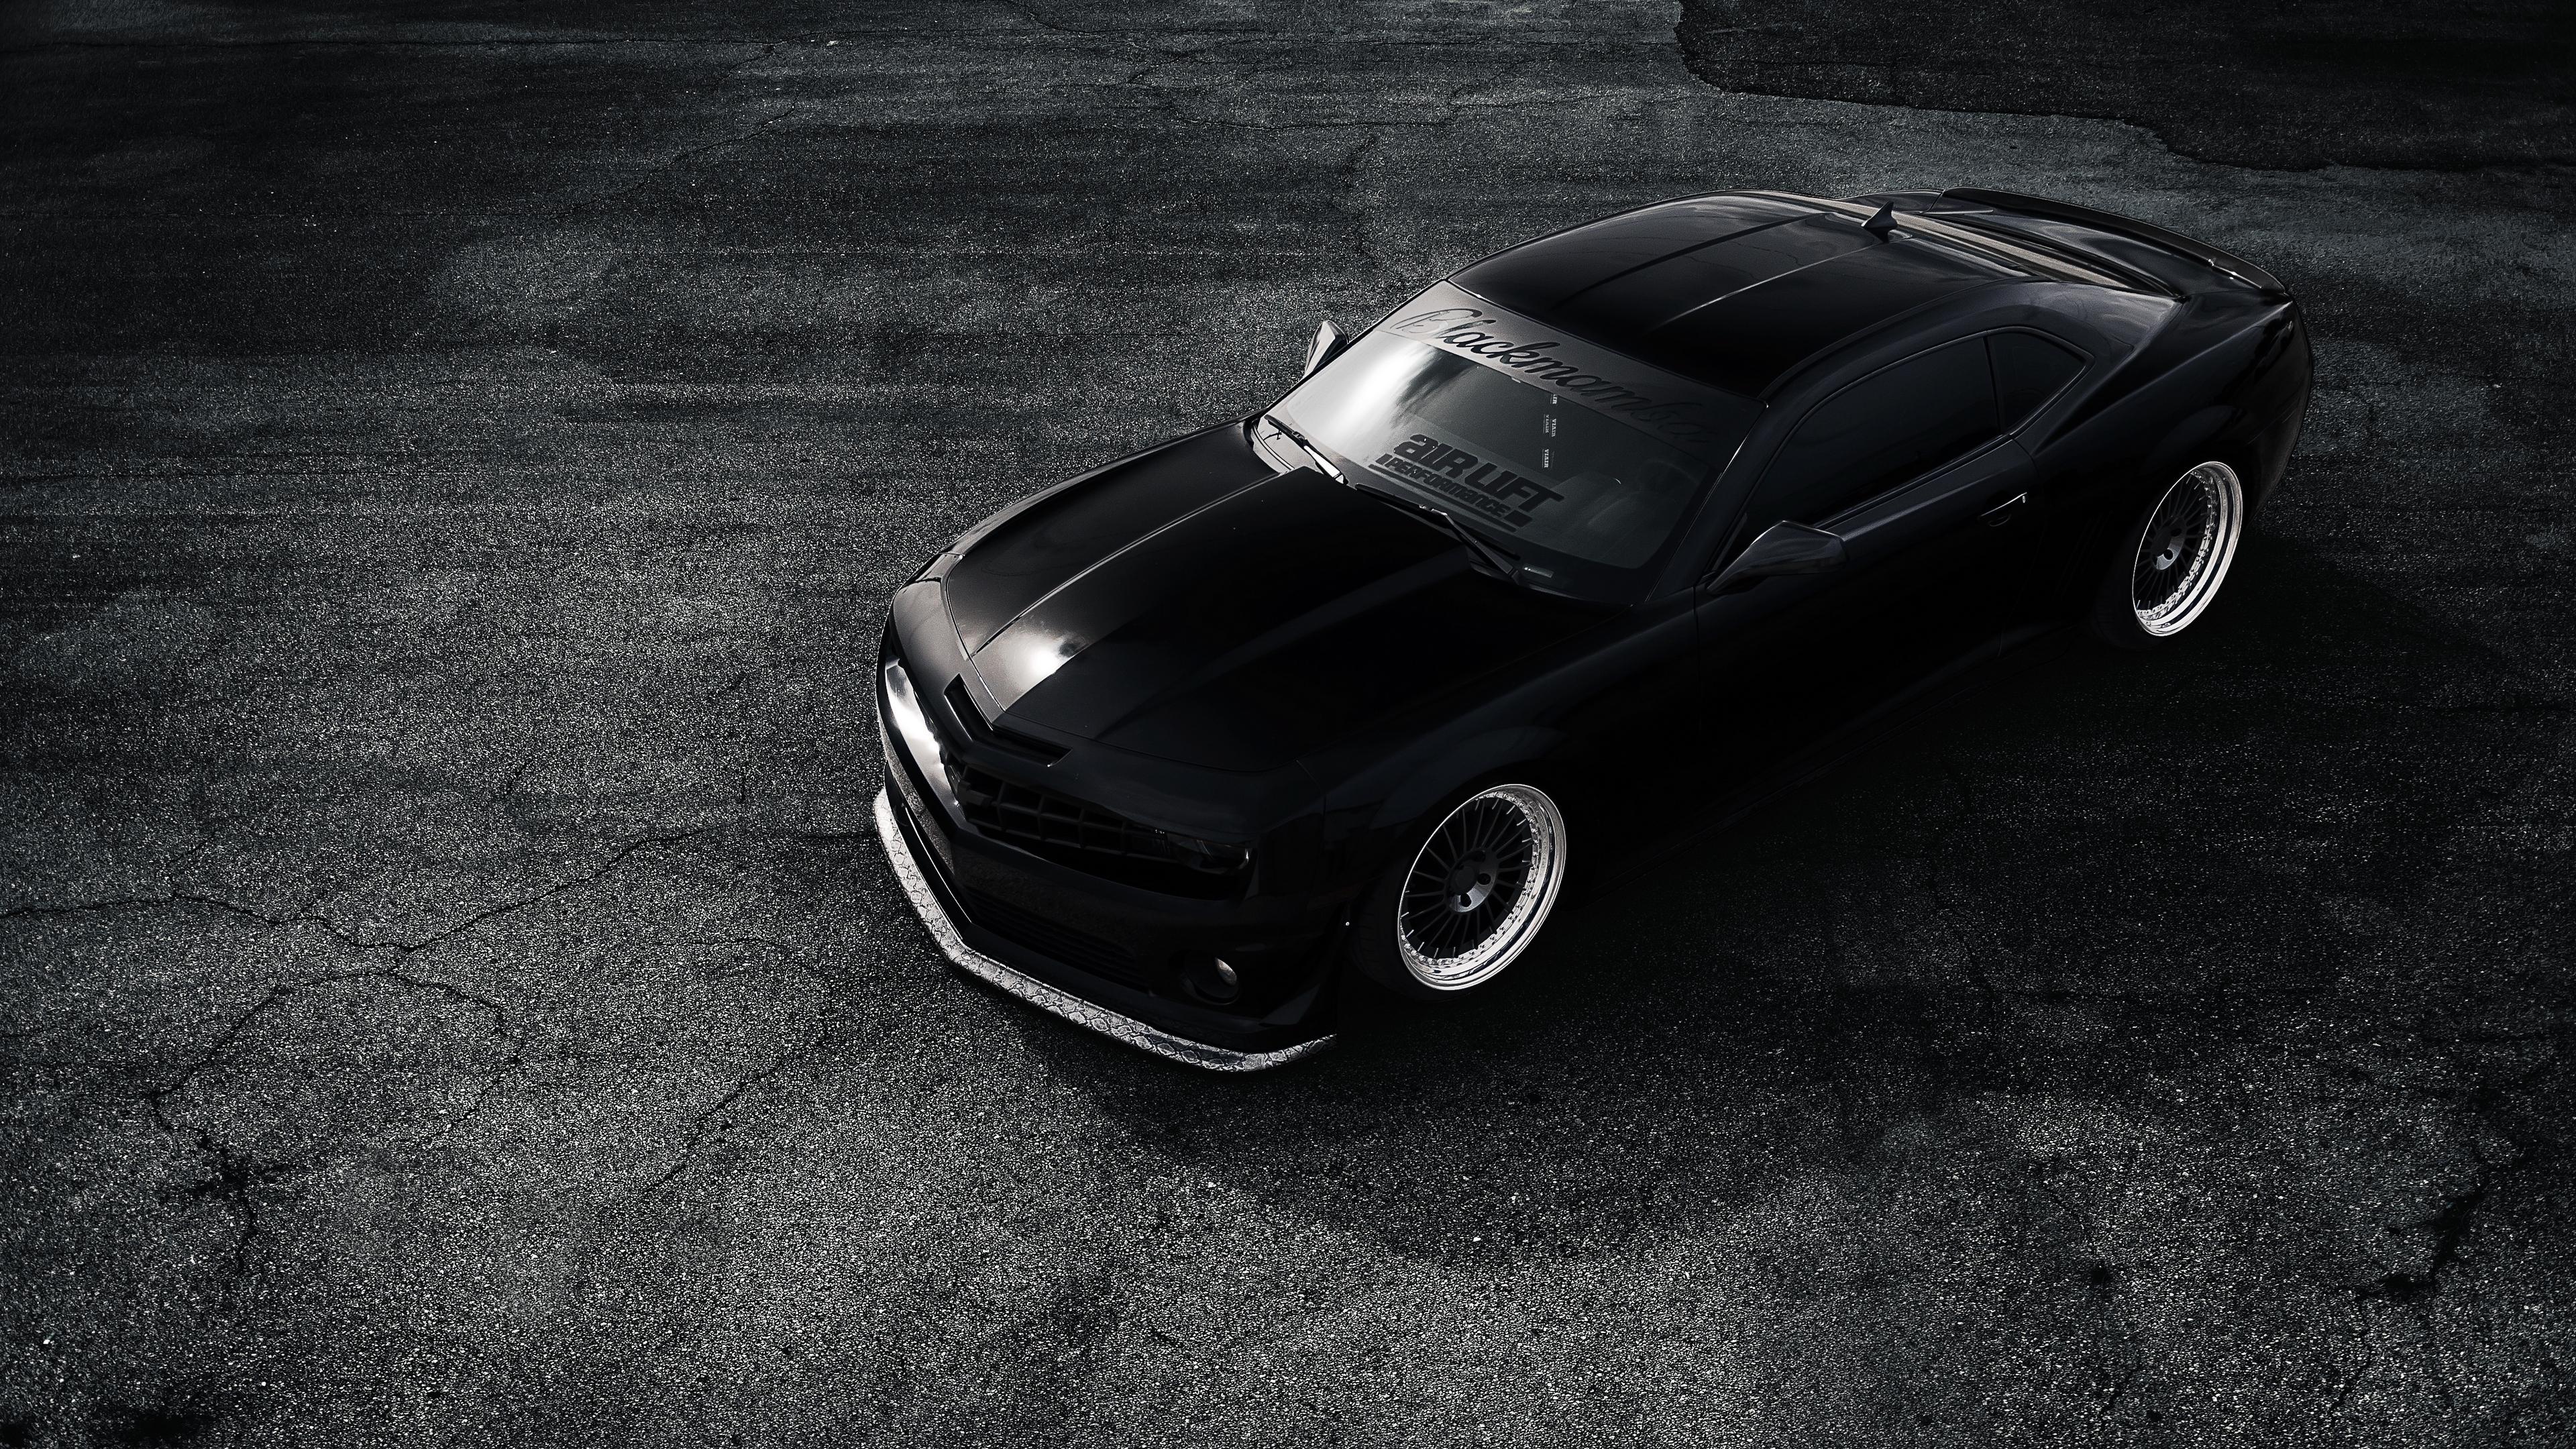 chevrolet camaro zl1 matt black 4k 1538937567 - chevrolet, camaro, zl1, matt, black 4k - ZL1, Chevrolet, Camaro